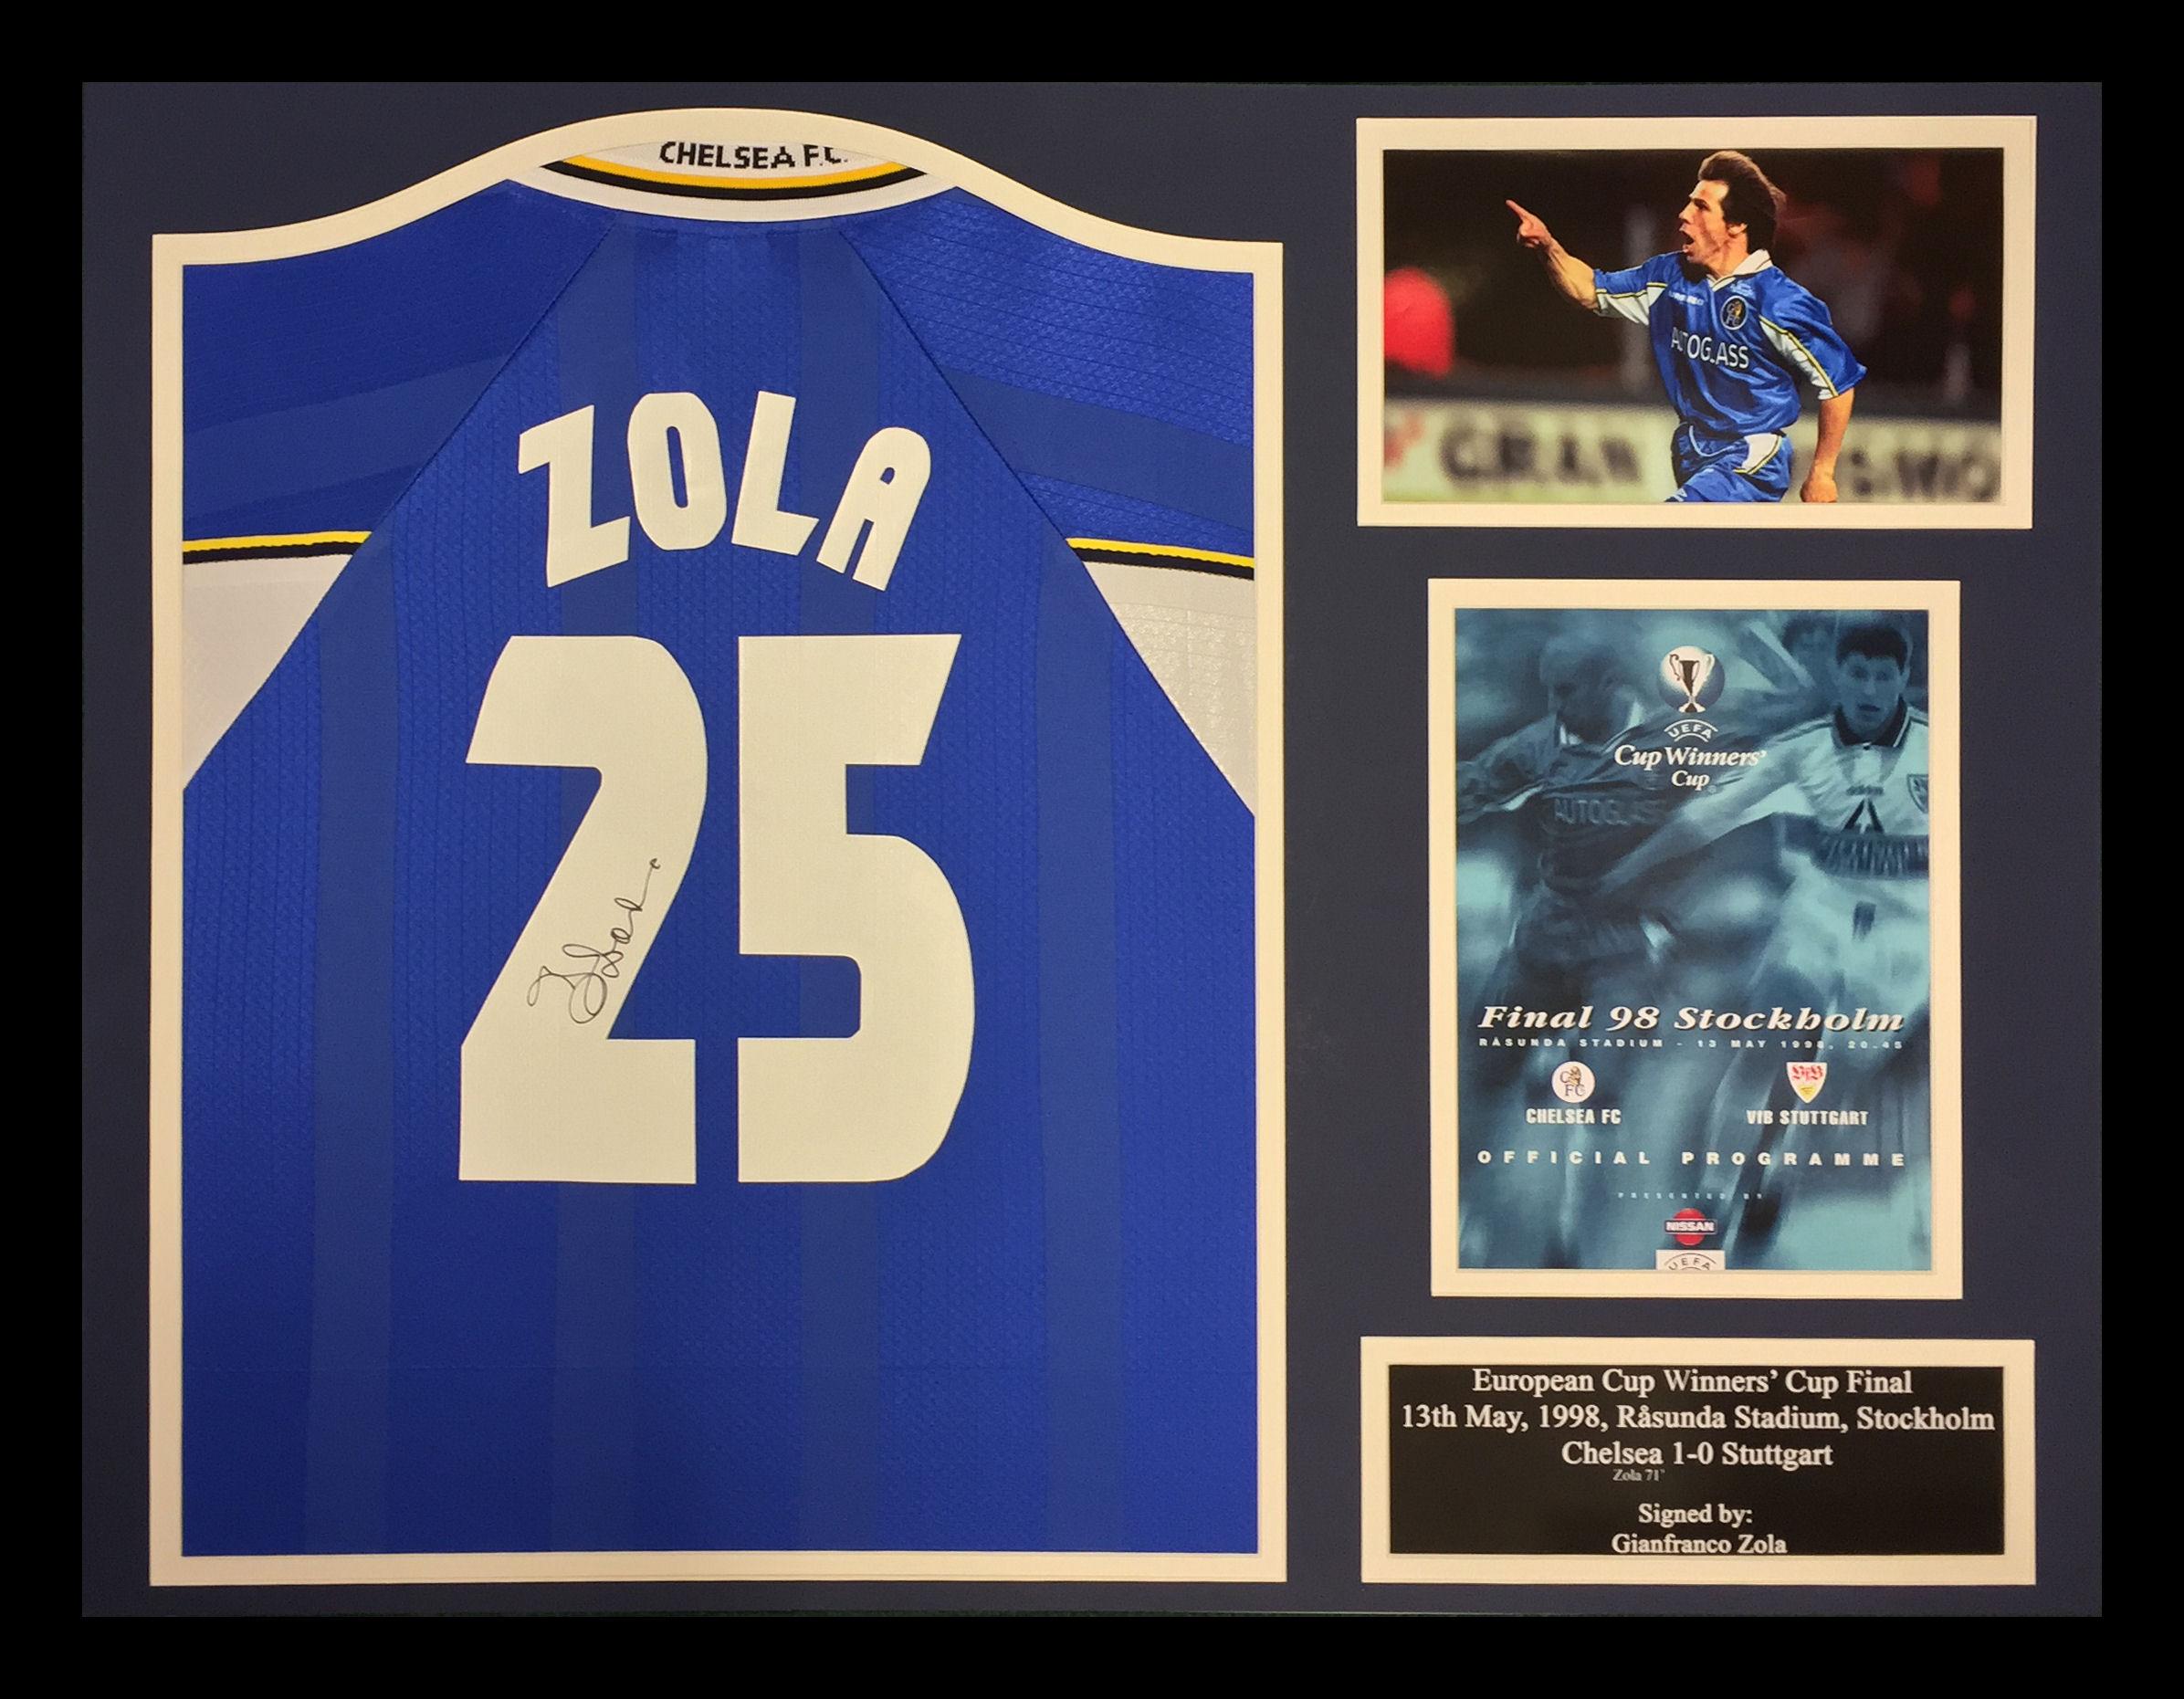 2d3c1576 Zola Signed Chelsea Shirt